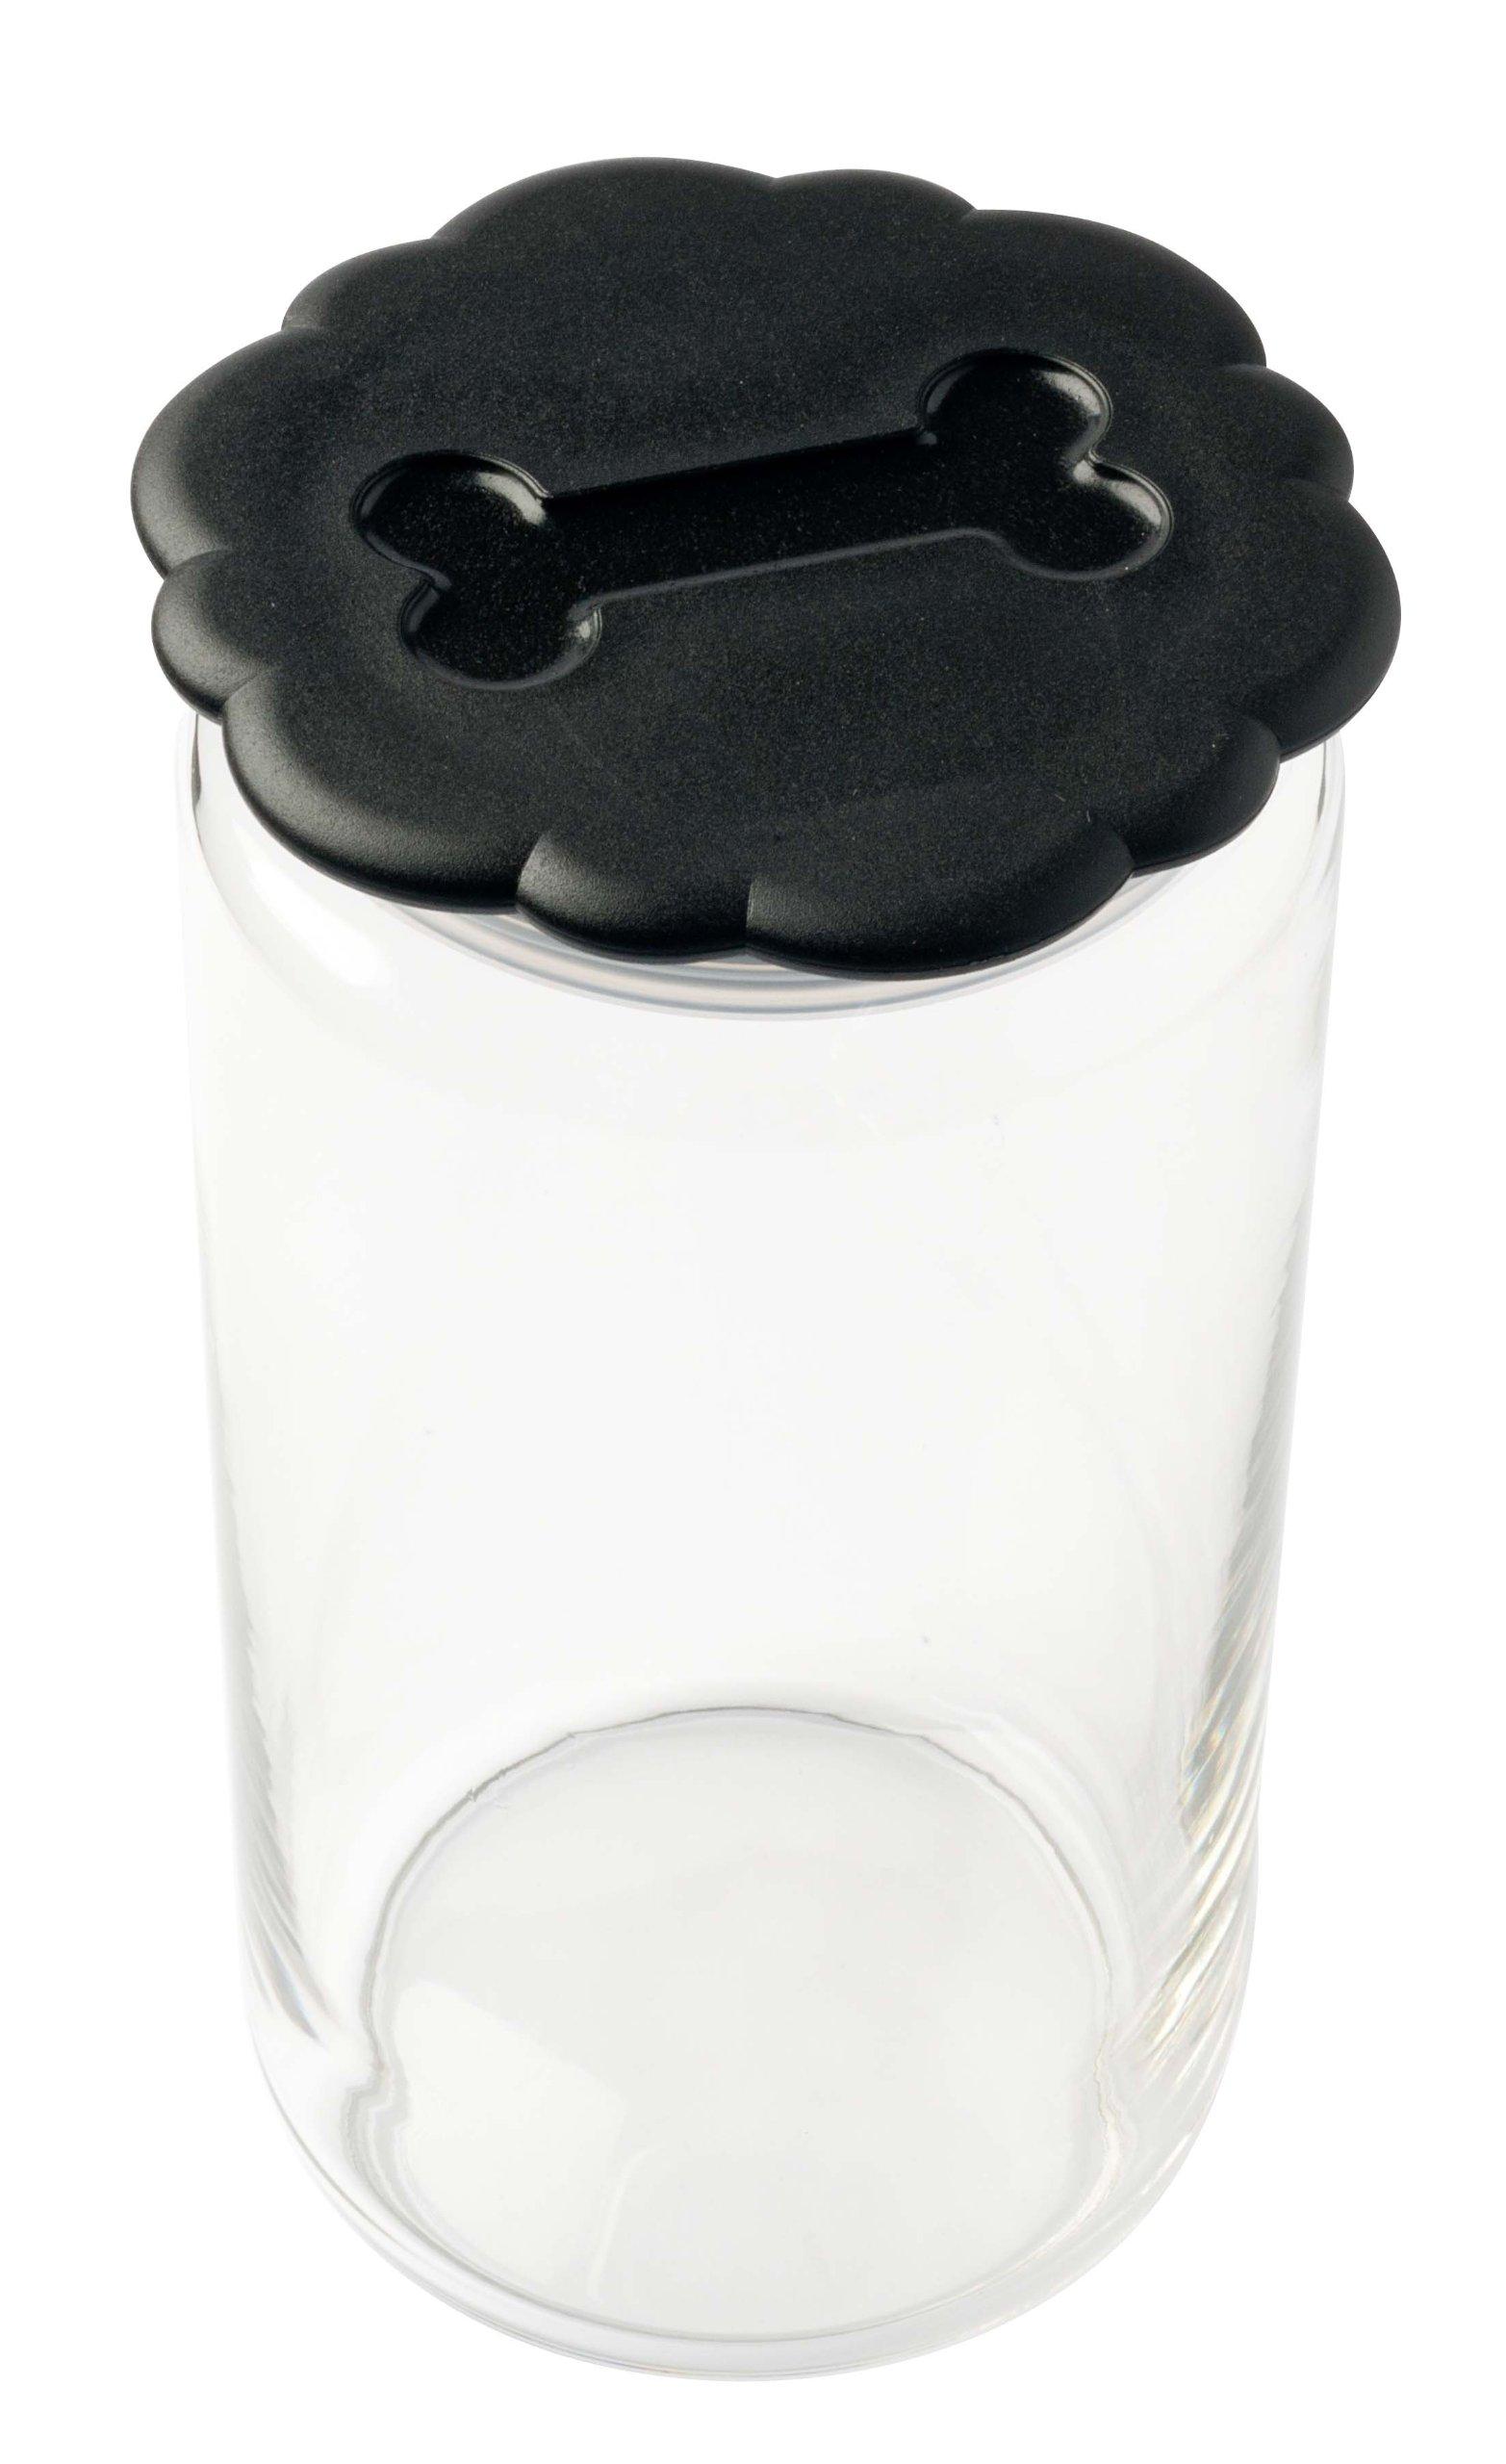 Petego Pet Treat Cookie Jar, Large, Black